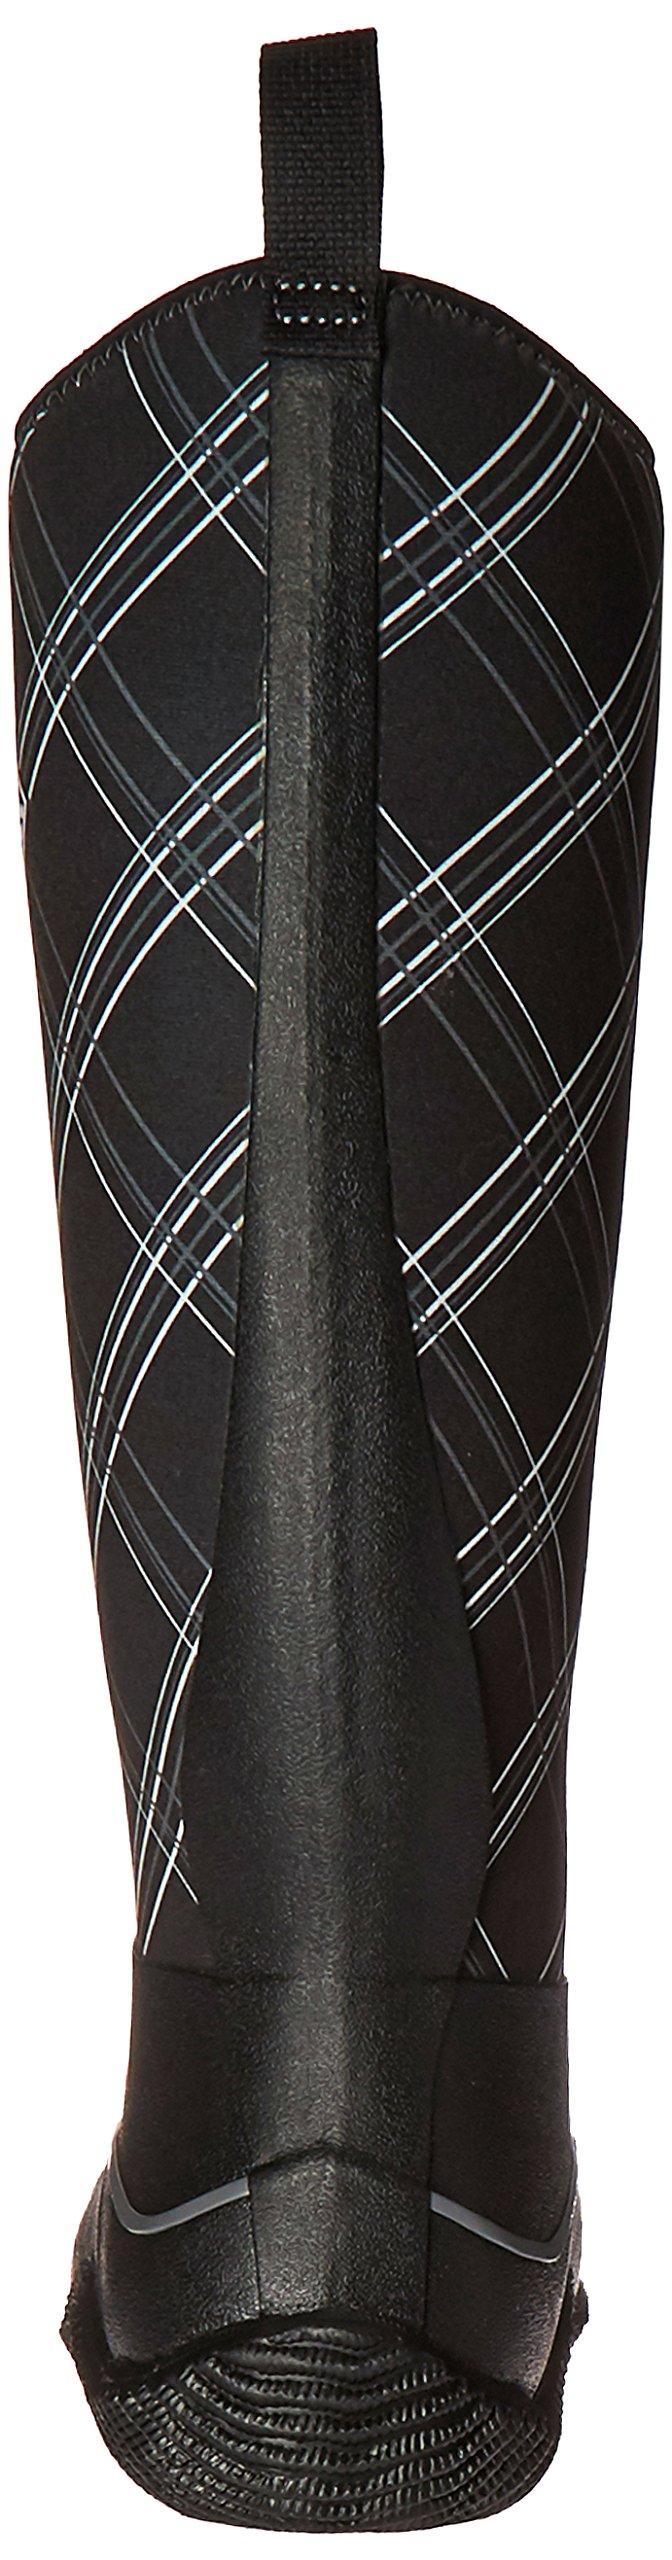 Muck Hale Multi-Season Women's Rubber Boots by Muck Boot (Image #2)